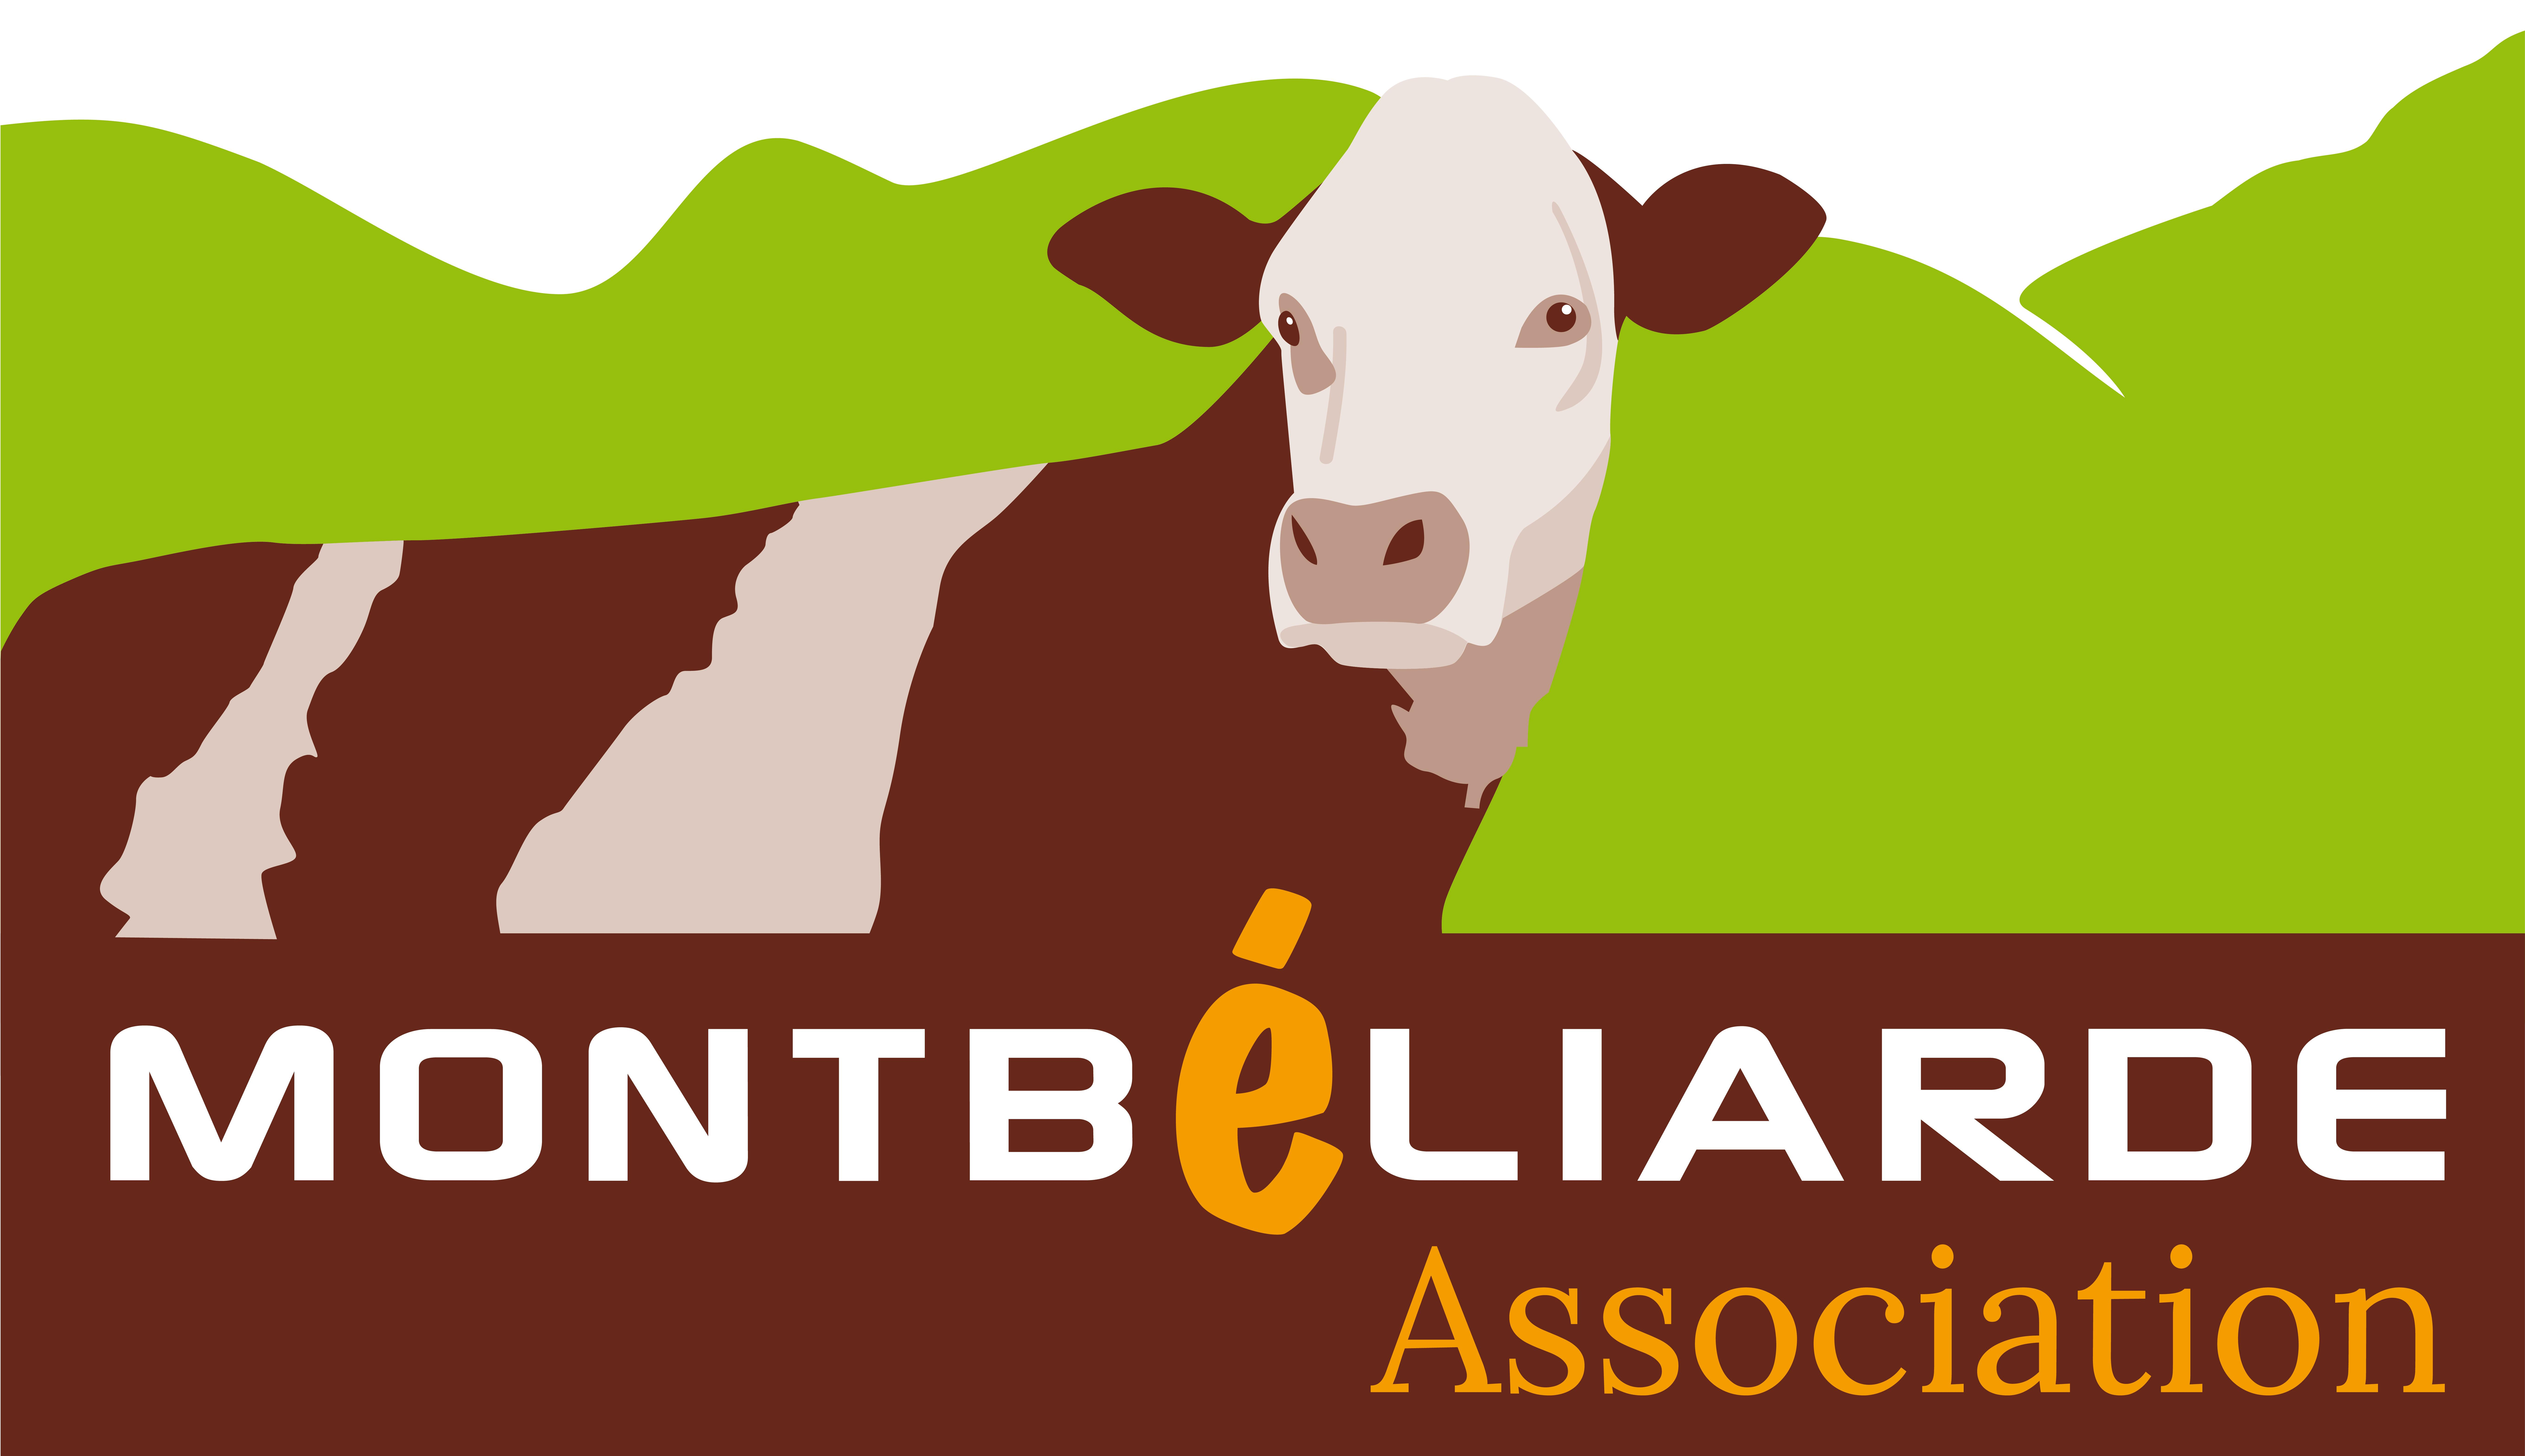 Montbéliarde Association